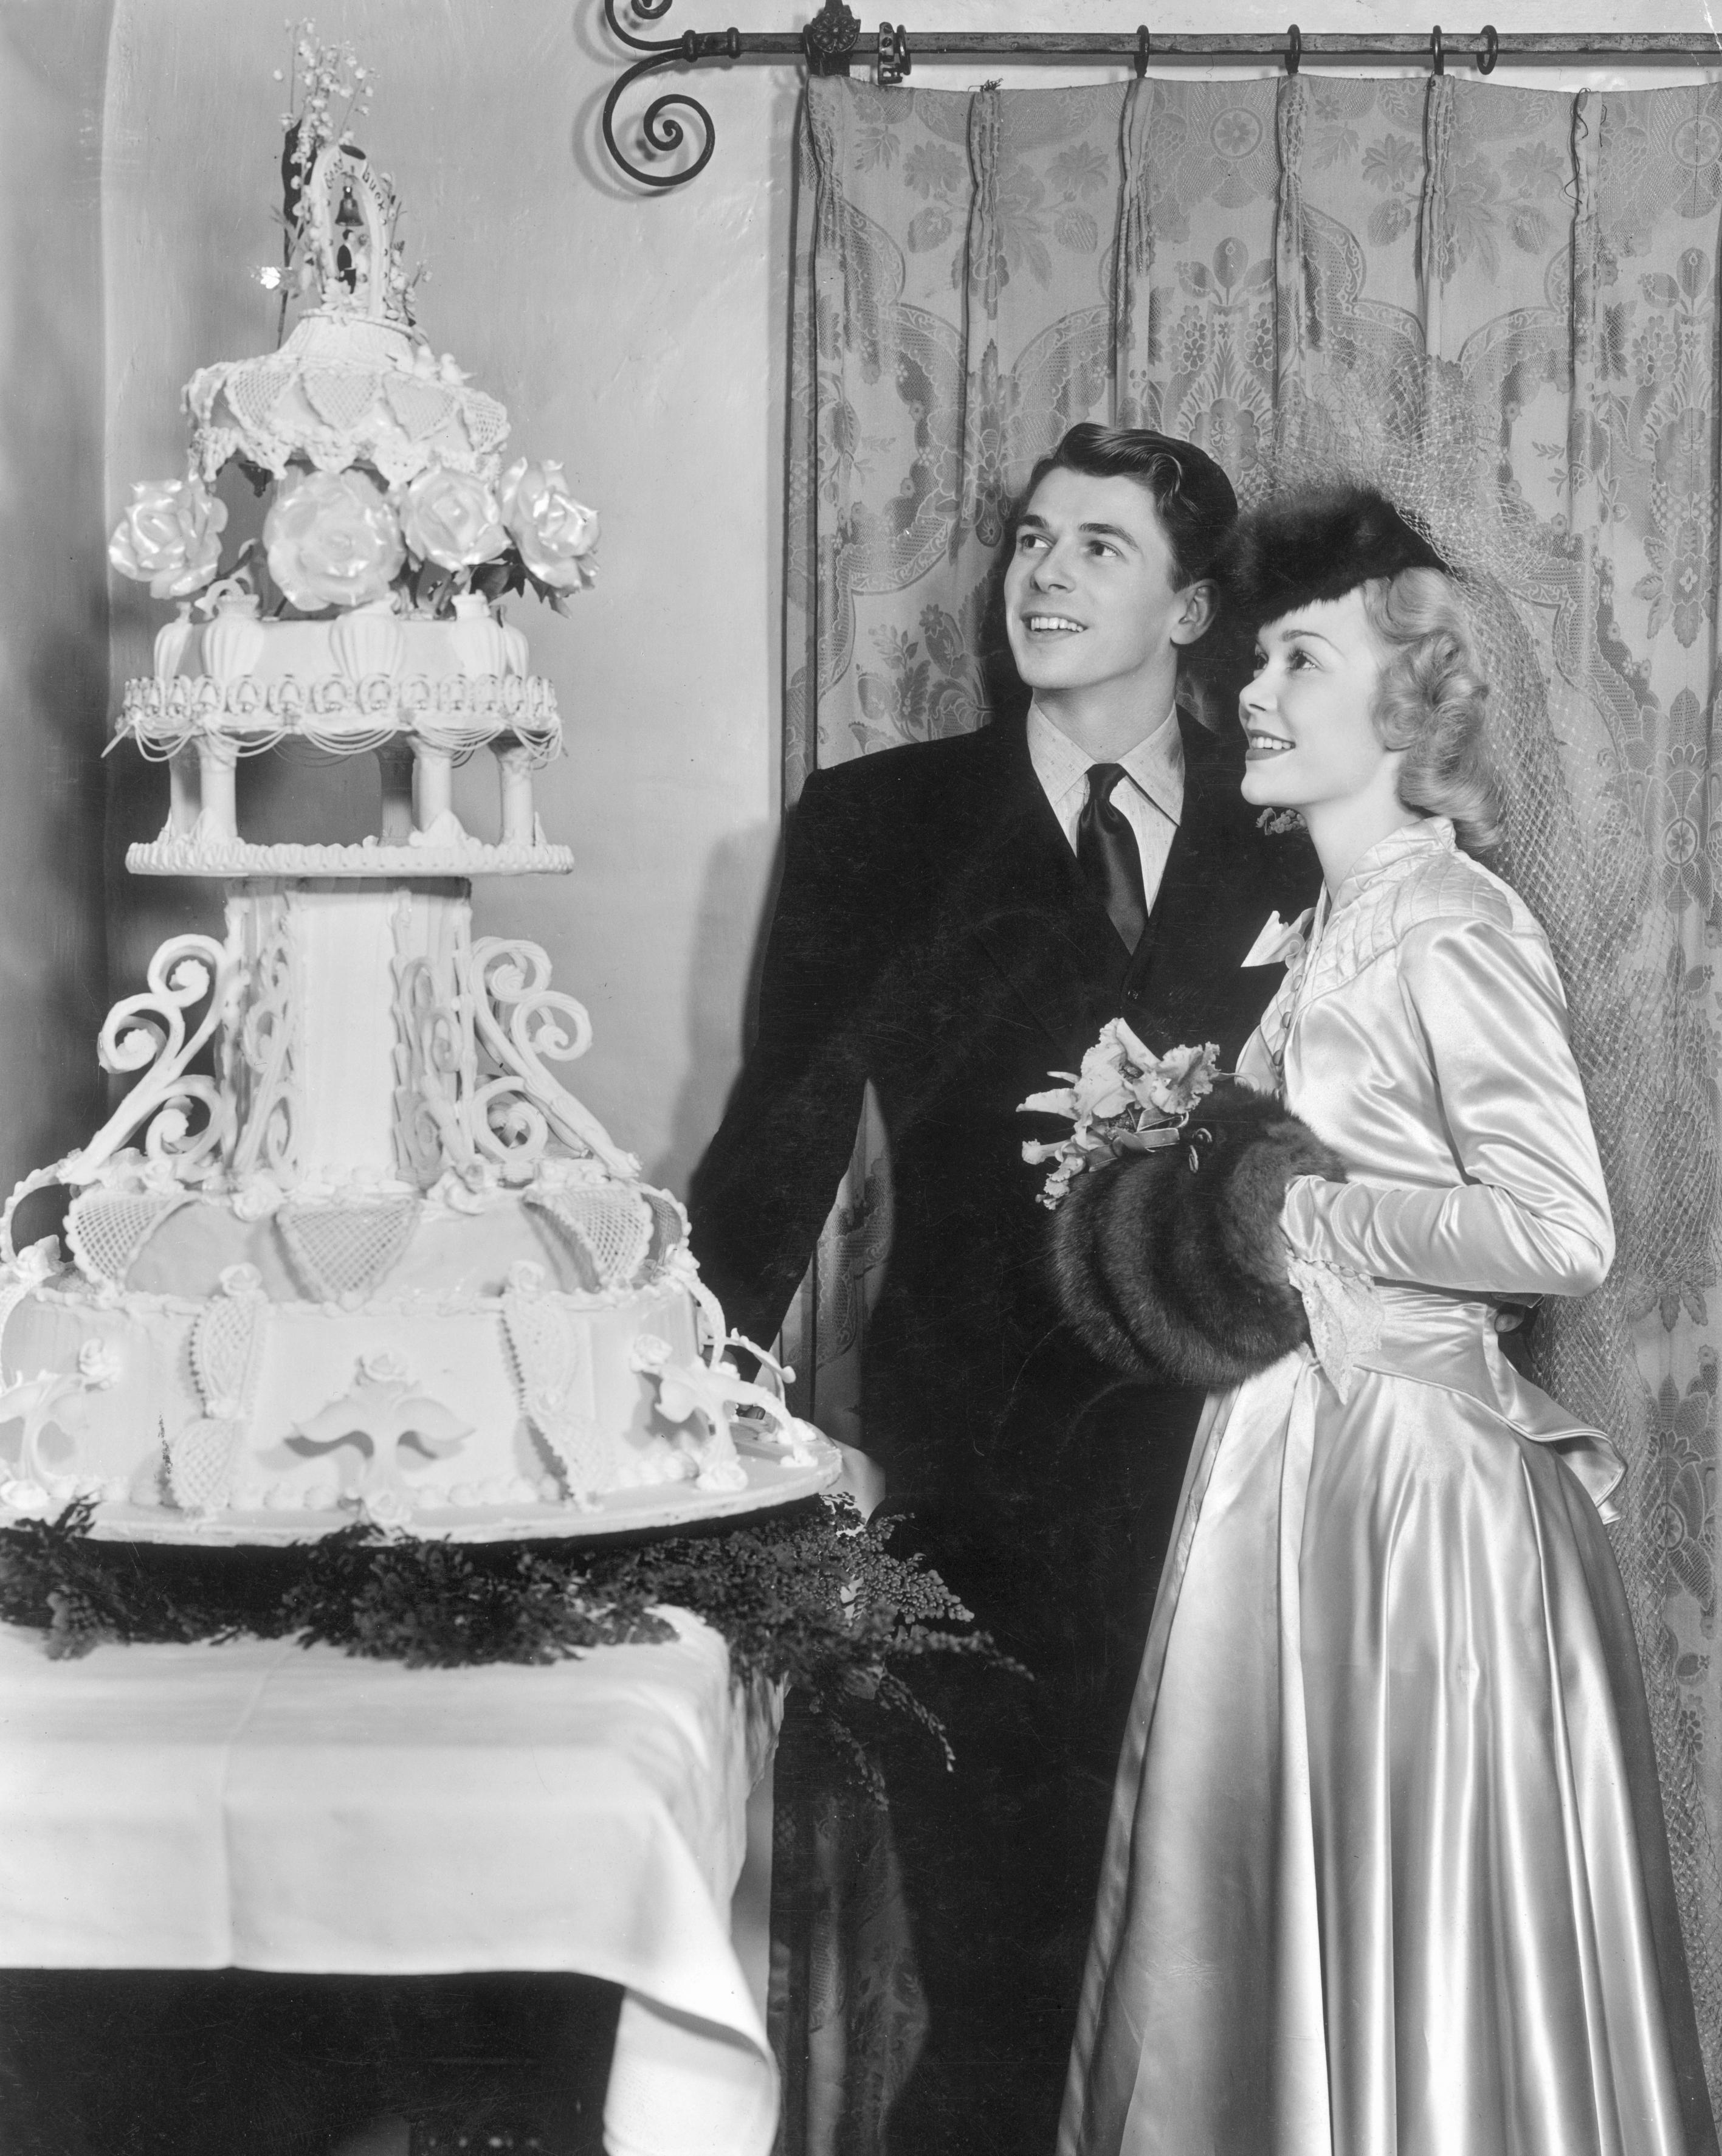 celebrity-vintage-wedding-cakes-ronald-reagan-3232075-1015.jpg